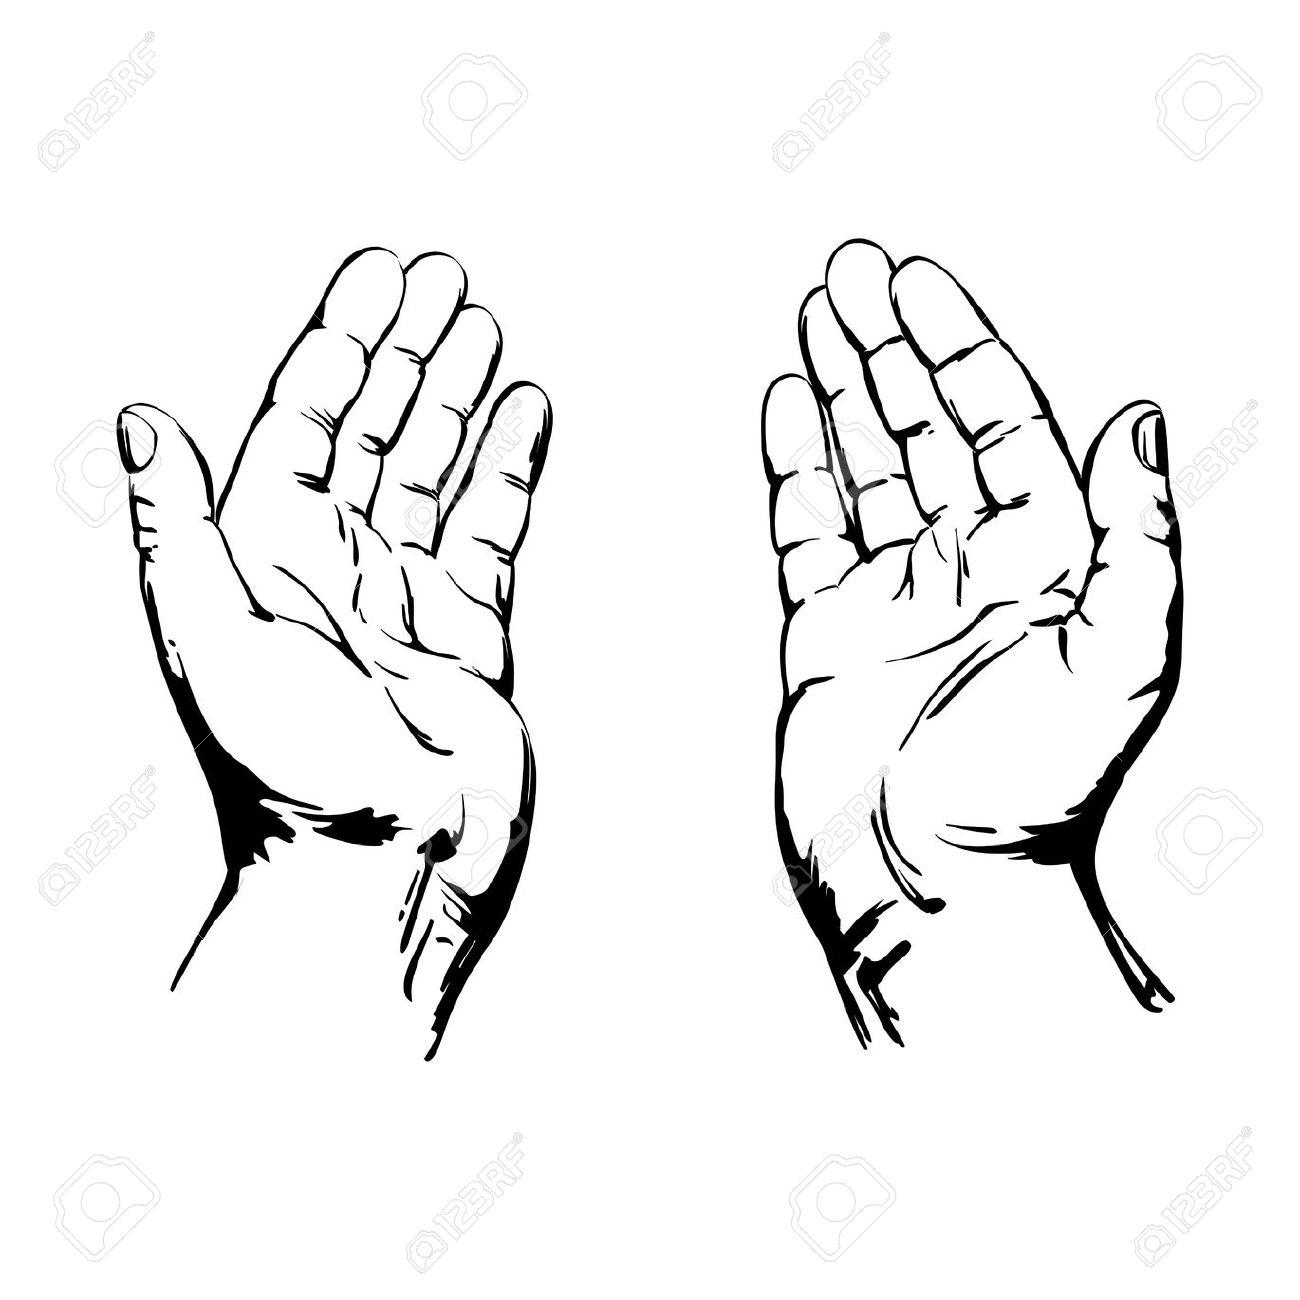 God's hand clipart.